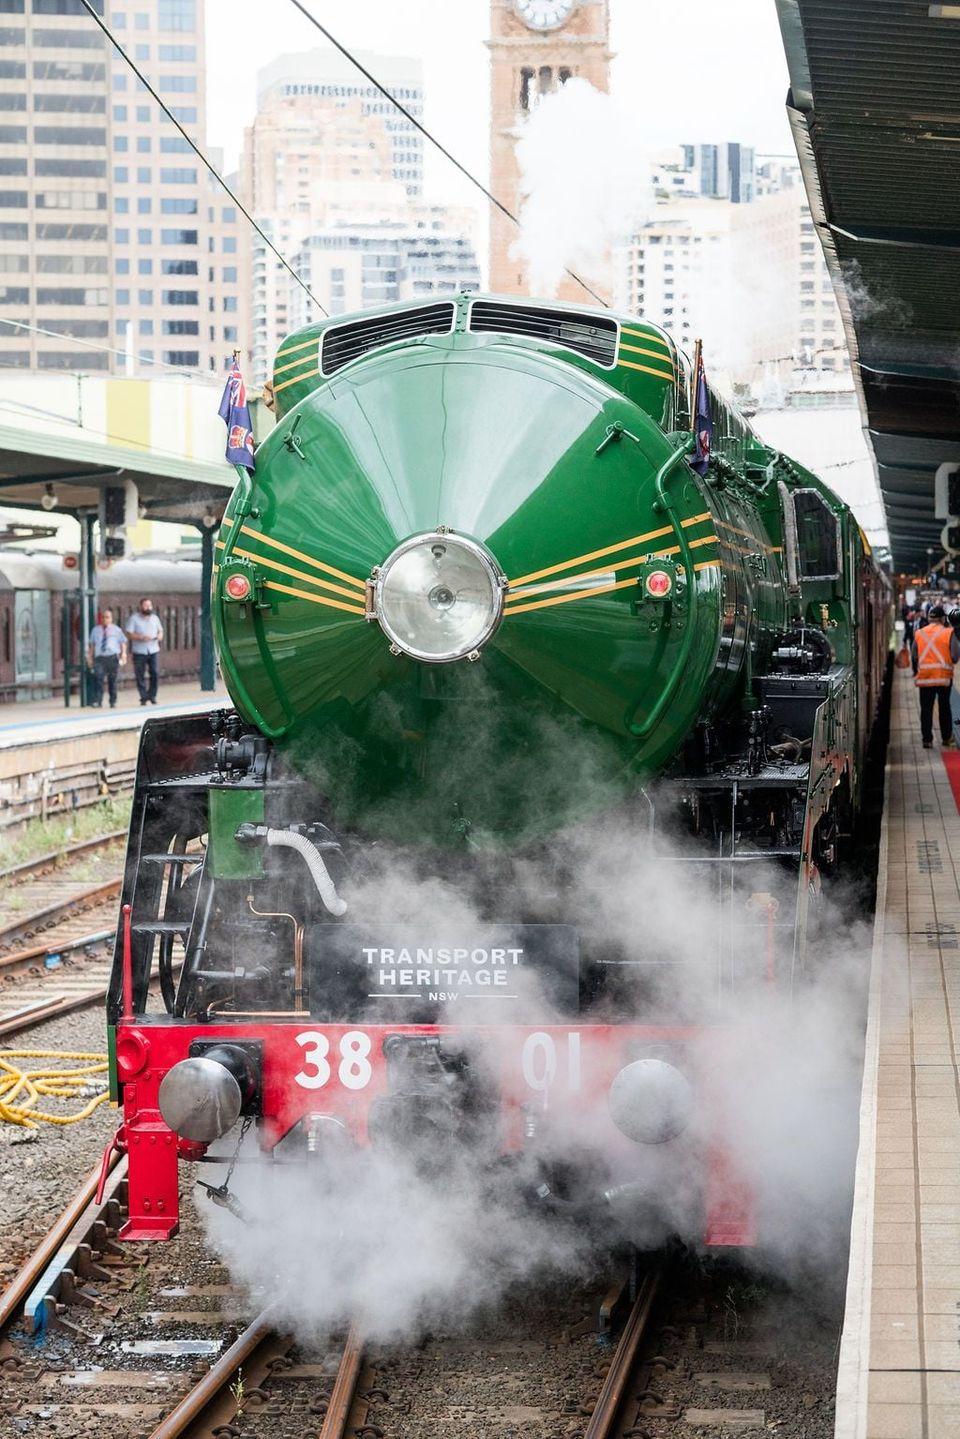 3801 train waiting at the station